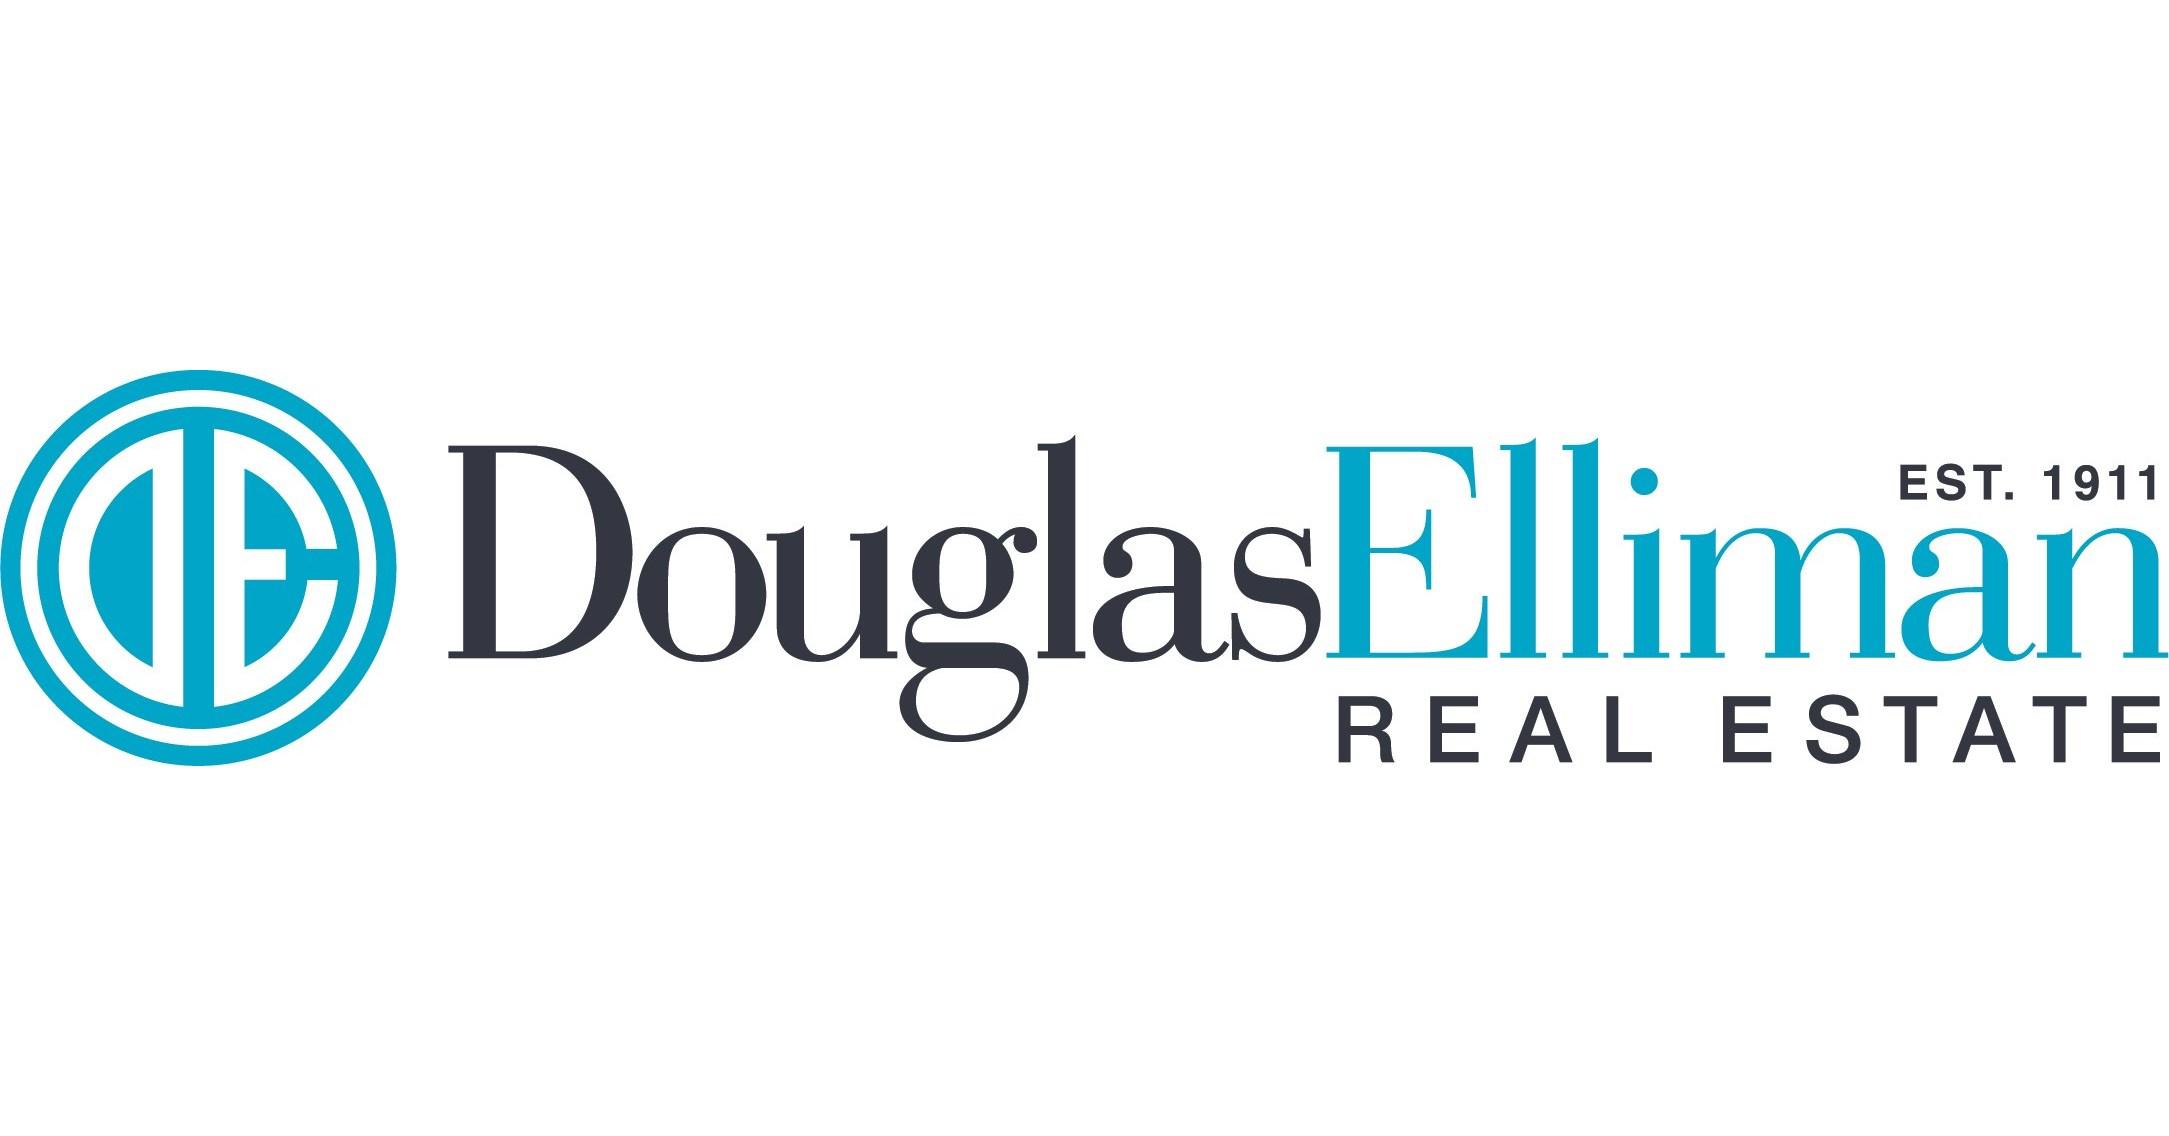 Douglas elliman releases q4 2017 manhattan sales market report for Douglas elliman real estate manhattan